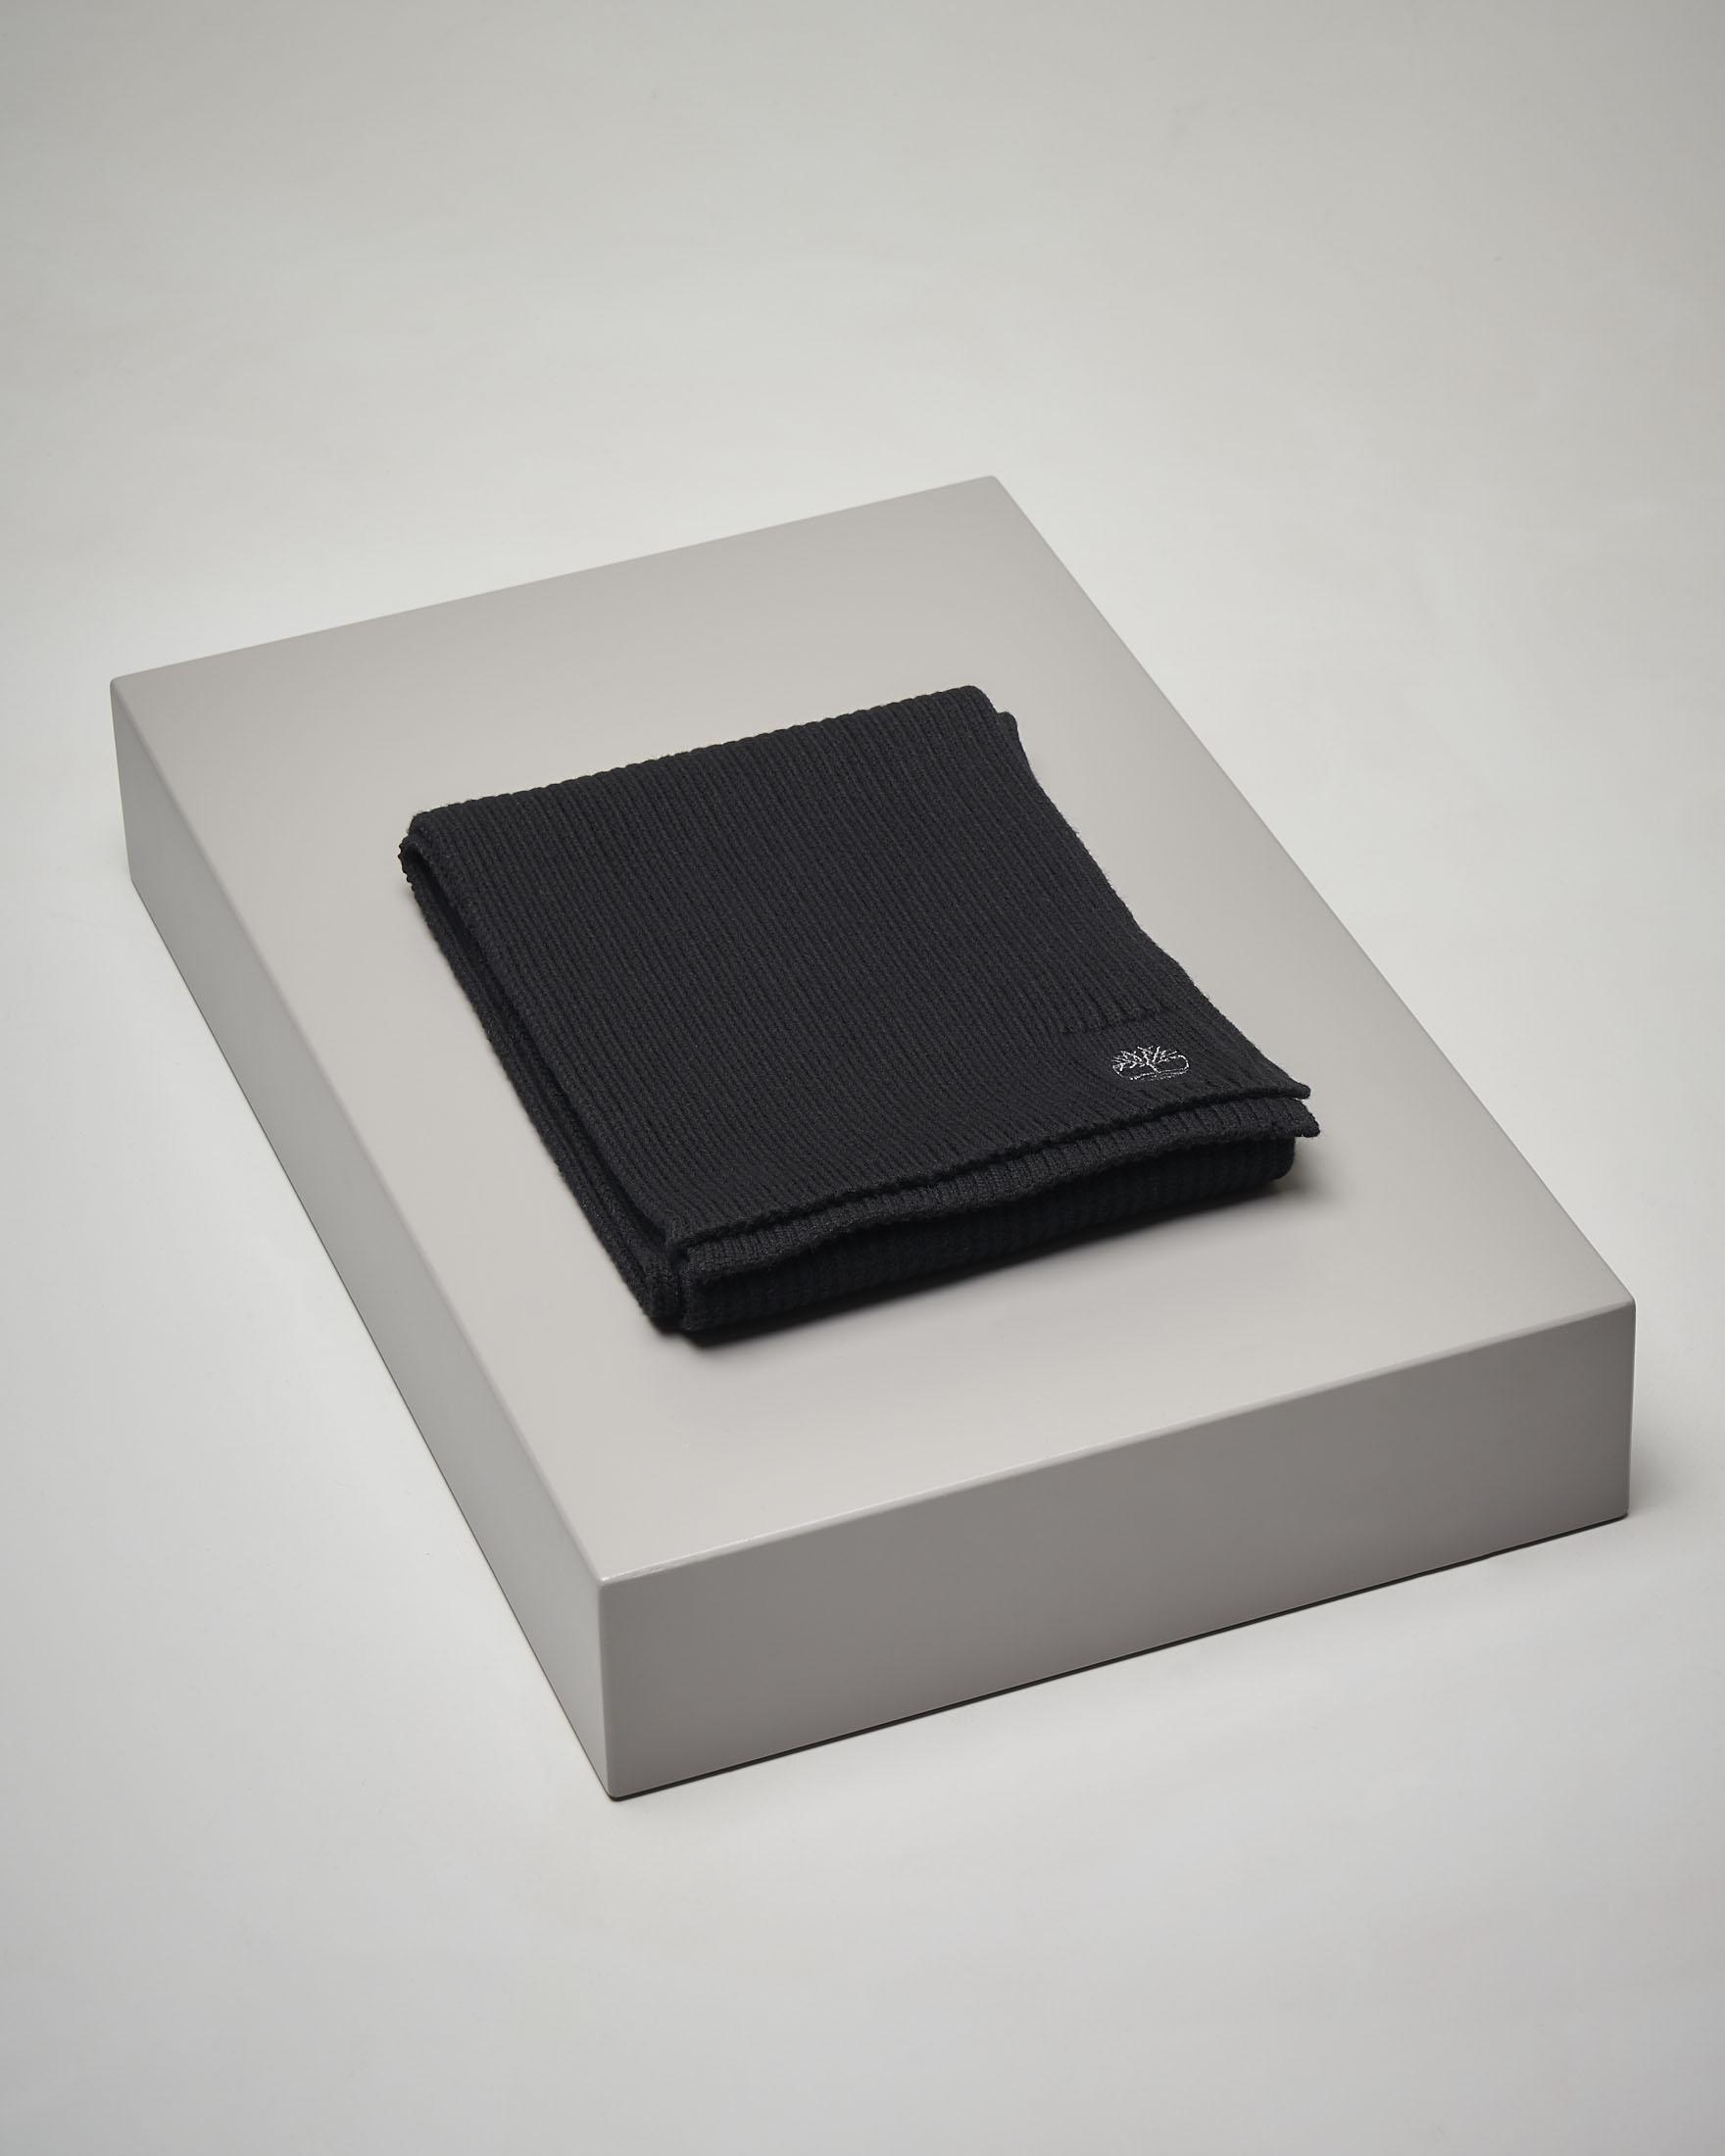 Sciarpa nera in cotone a costine